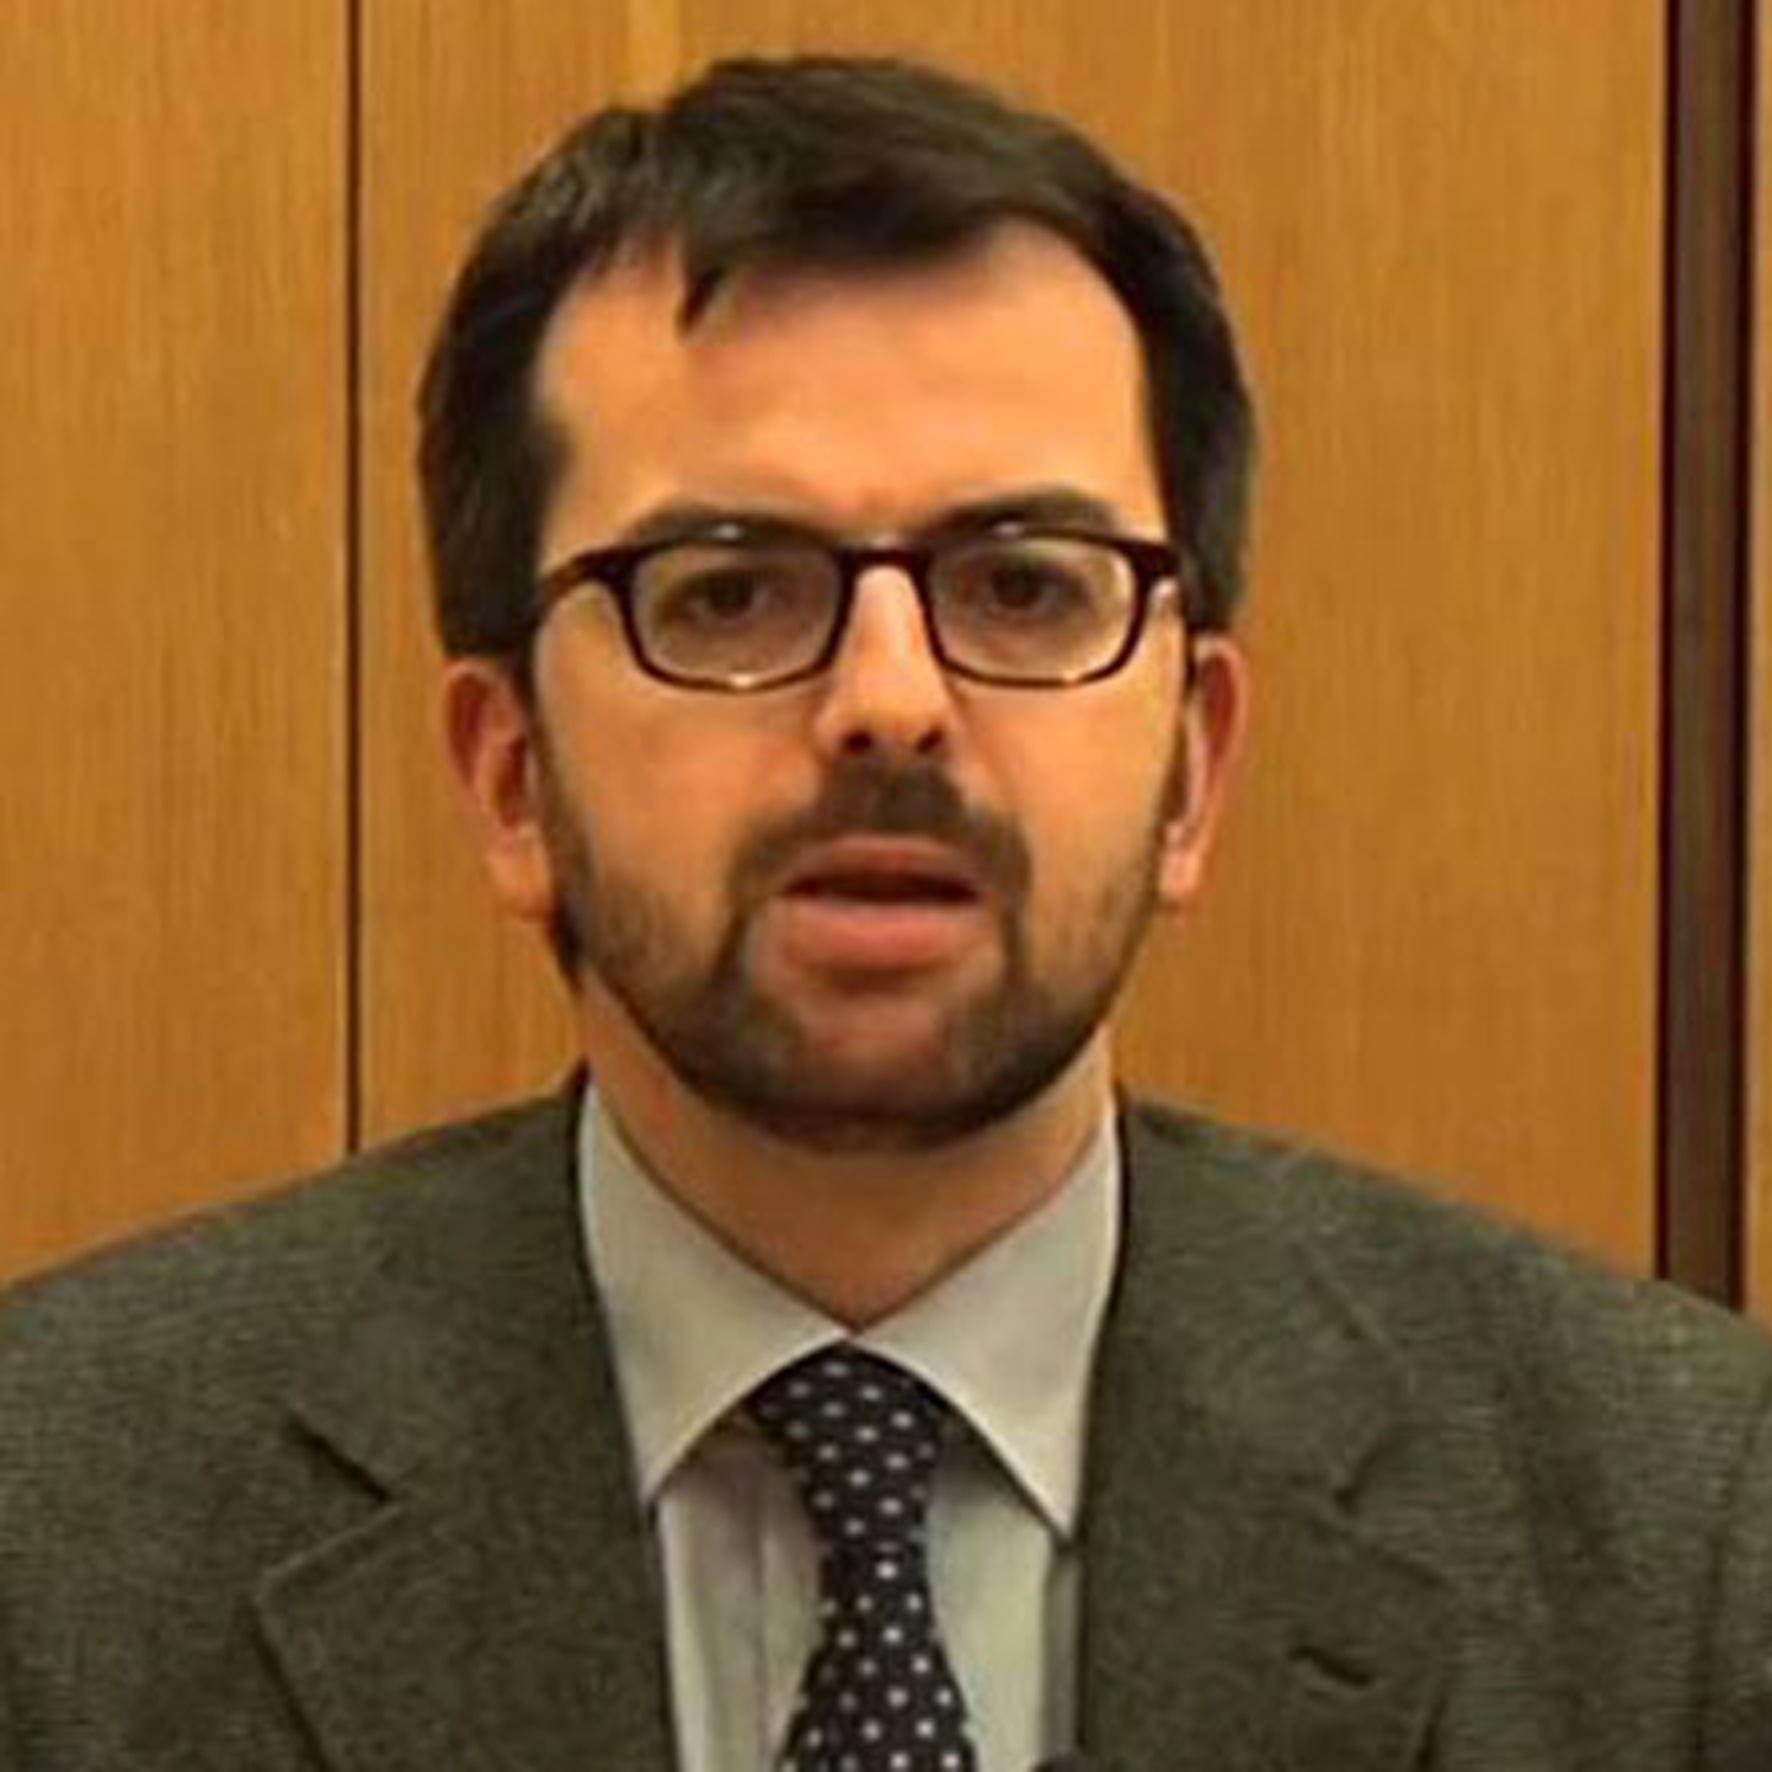 Pasquale Matteo Caputo